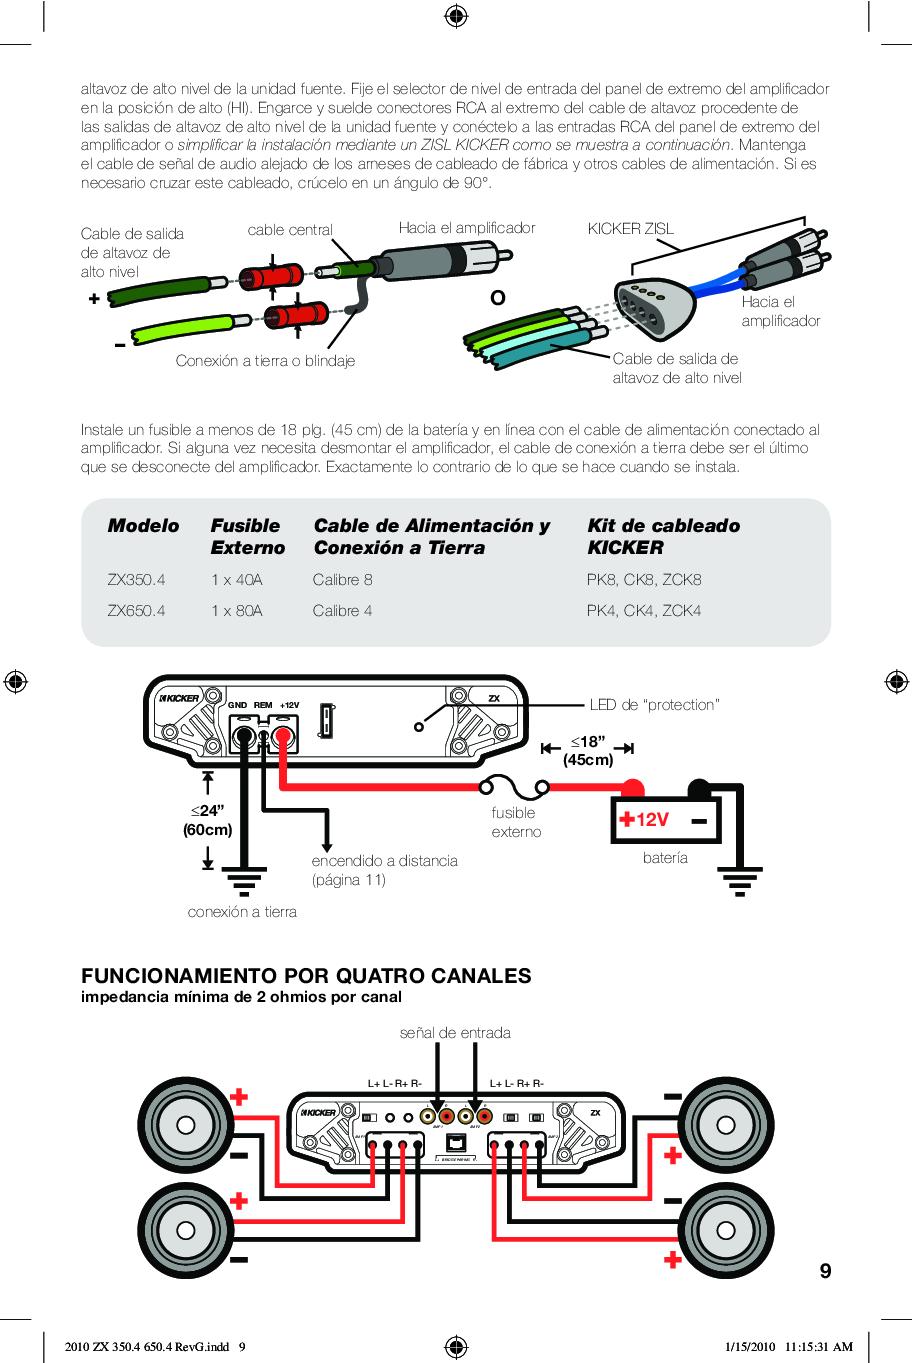 Kicker Zx700 5 Wiring Diagram